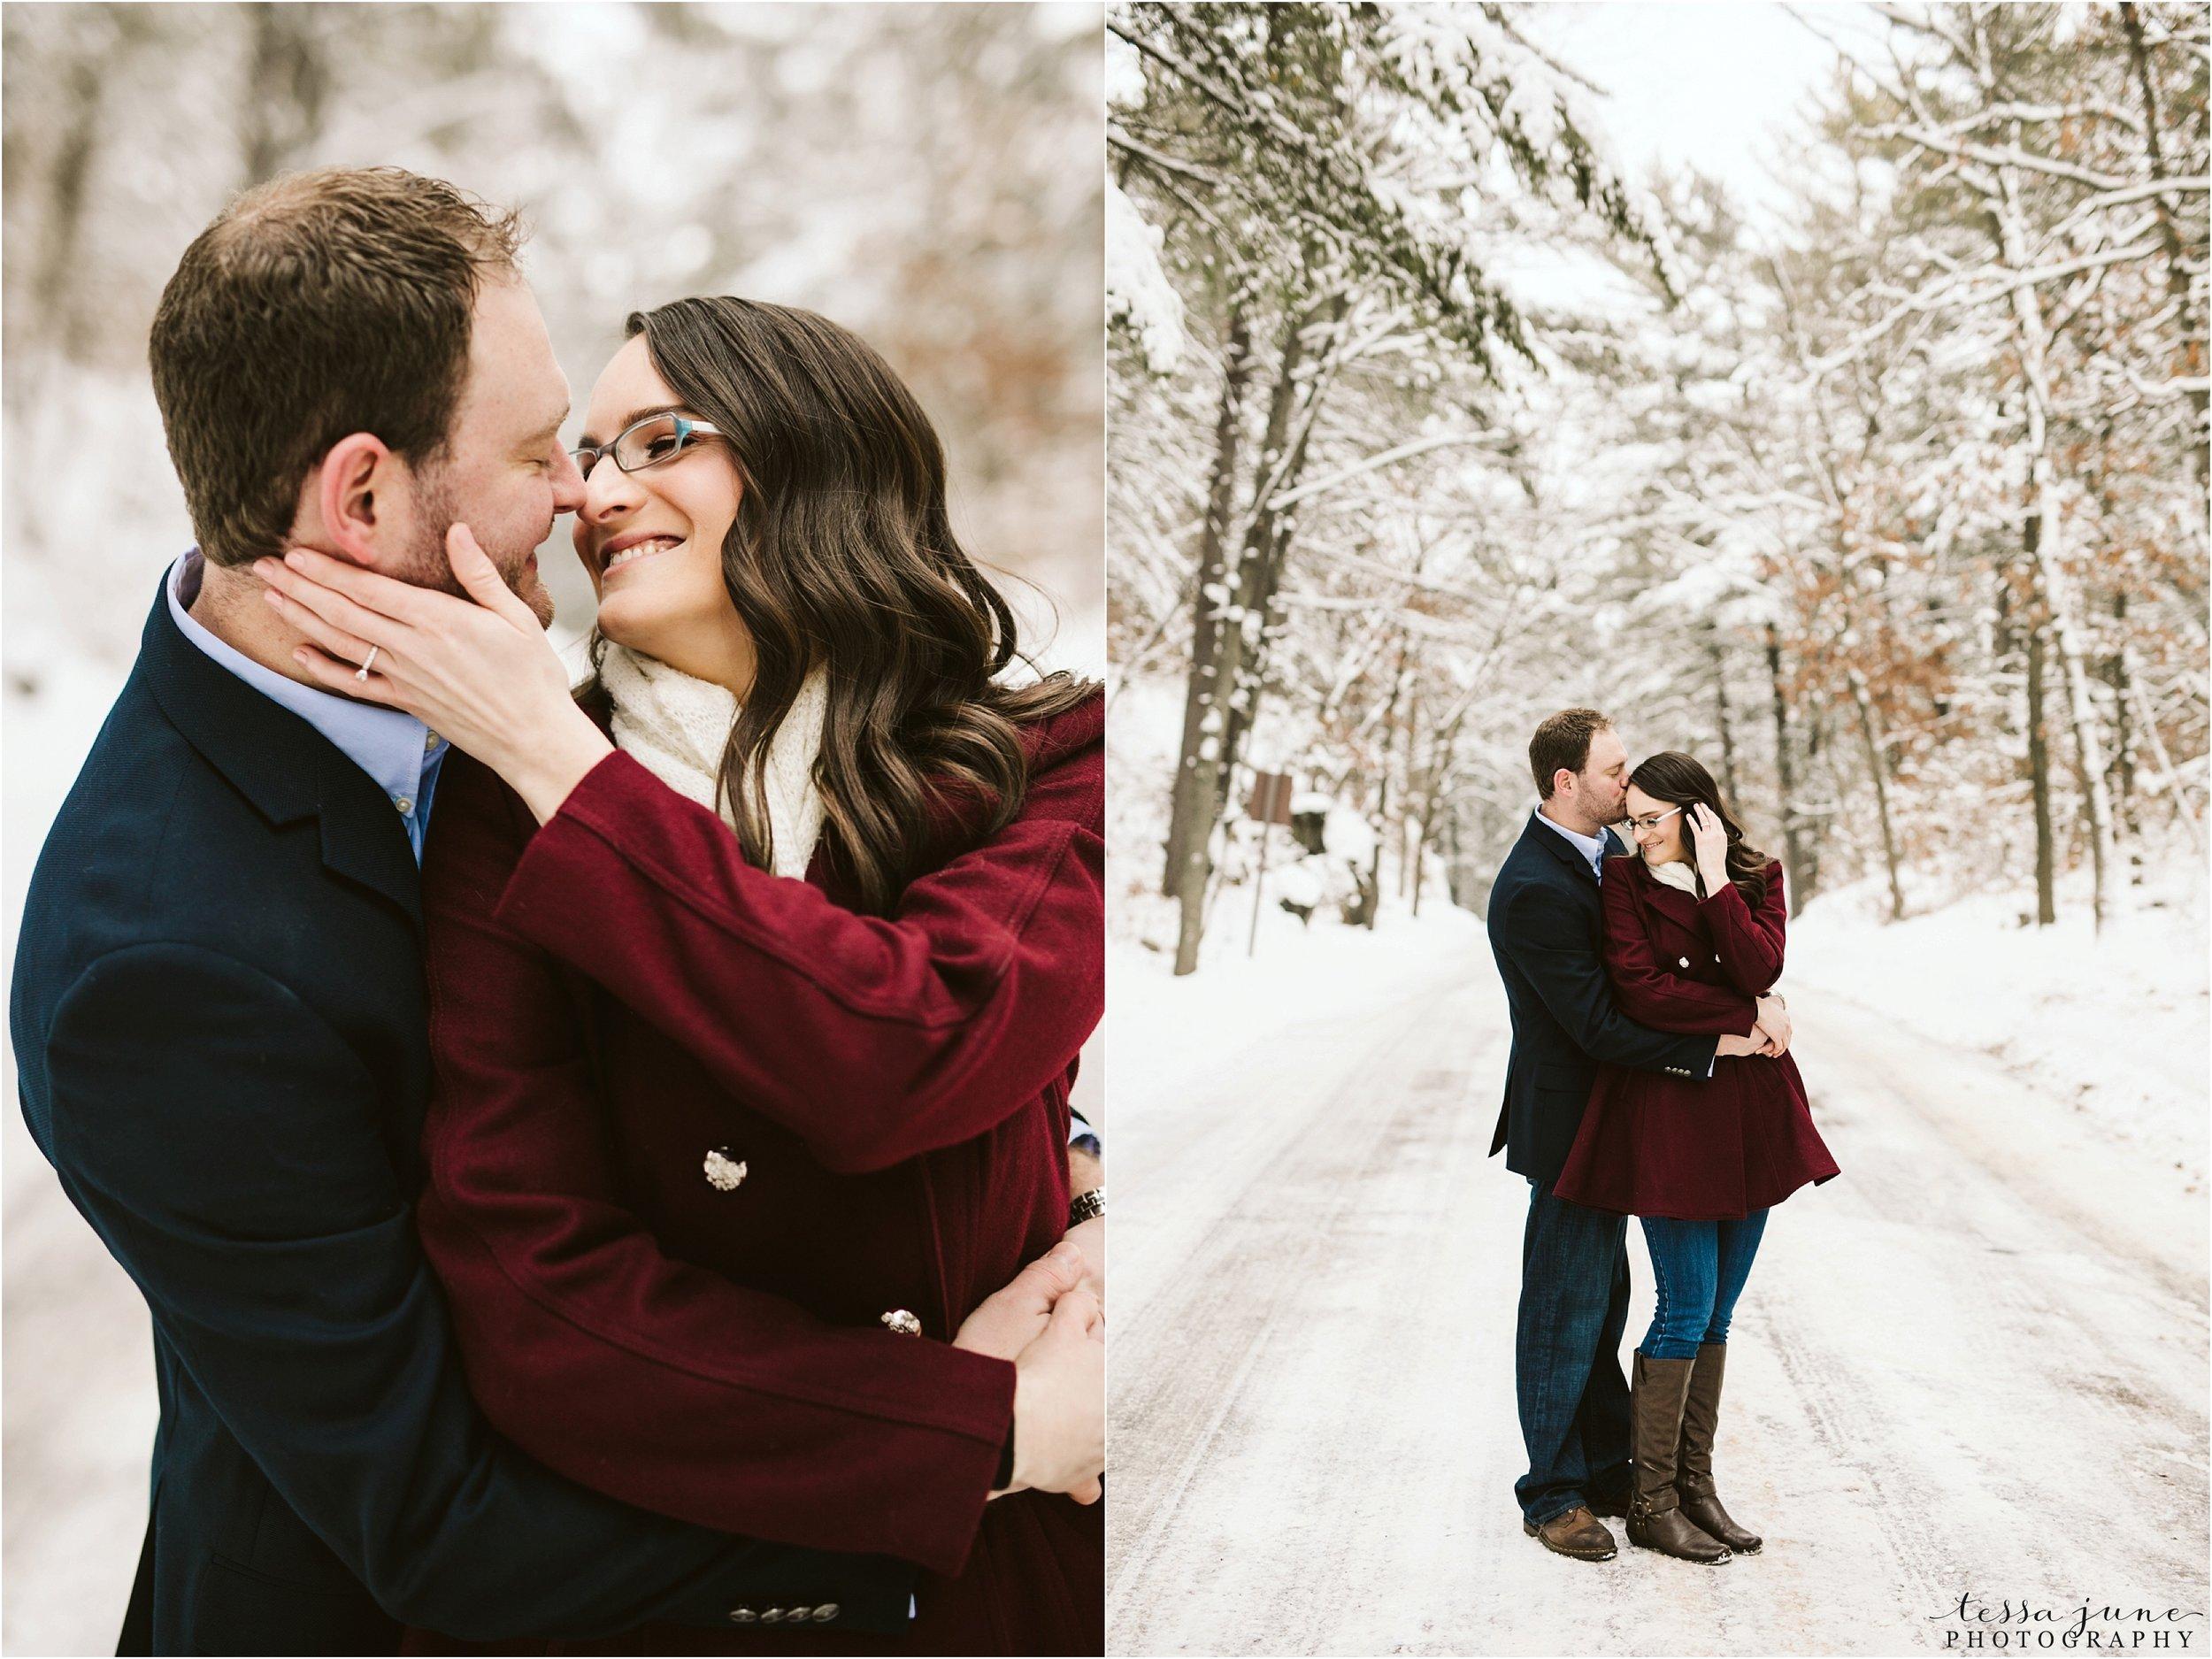 taylors-falls-winter-engagement-session-st-cloud-photographer-11.jpg